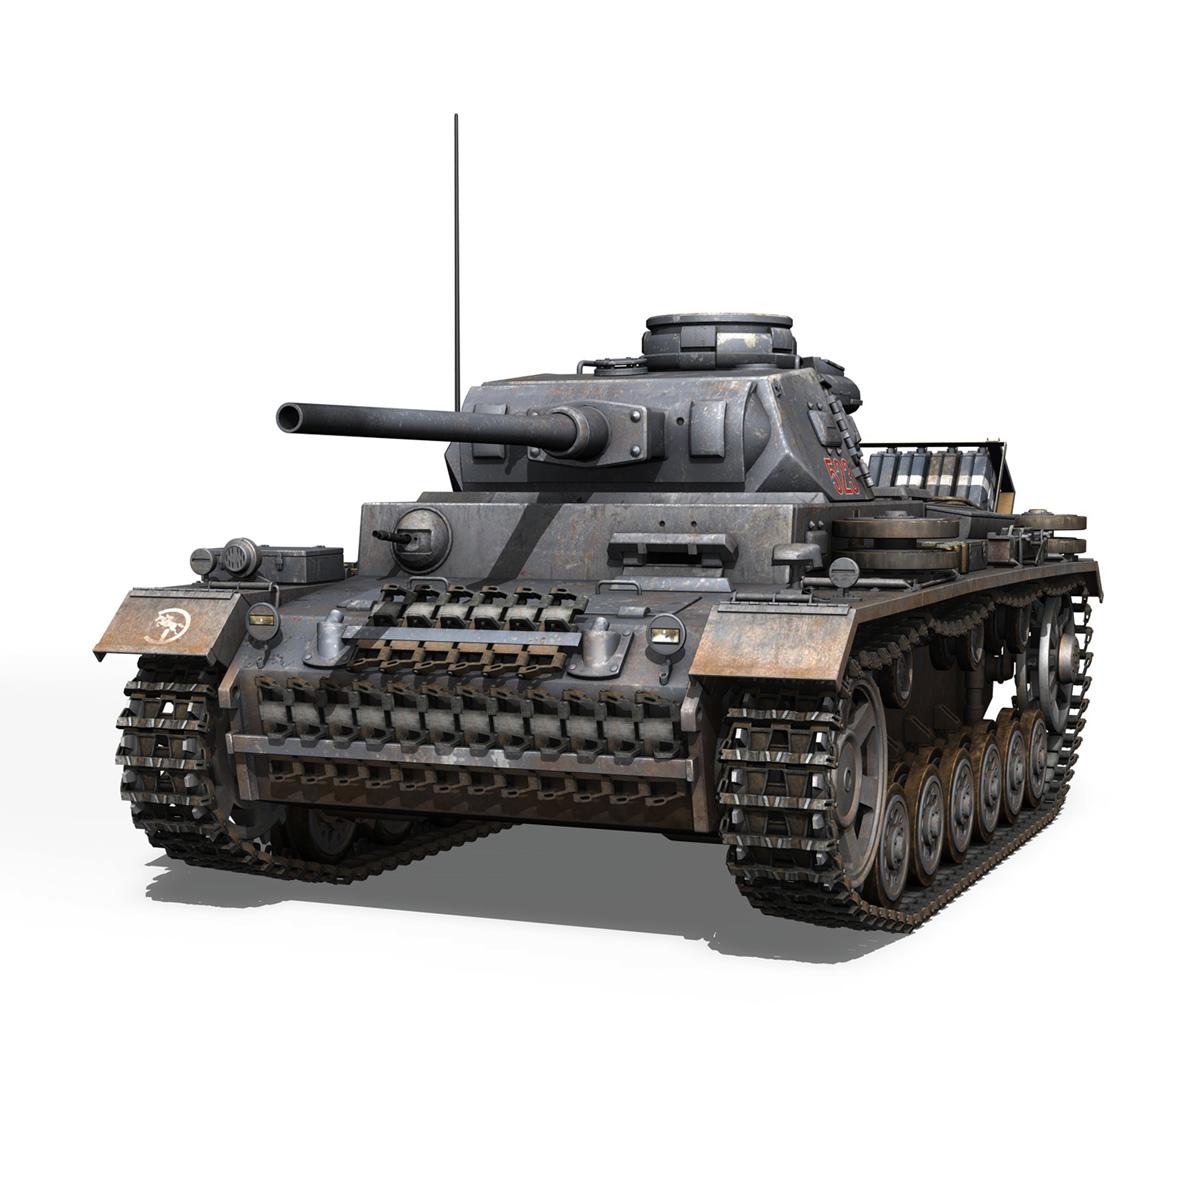 pzkpfw iii – panzer 3 – ausf.j – 523 3d model 3ds fbx c4d lwo obj 189075